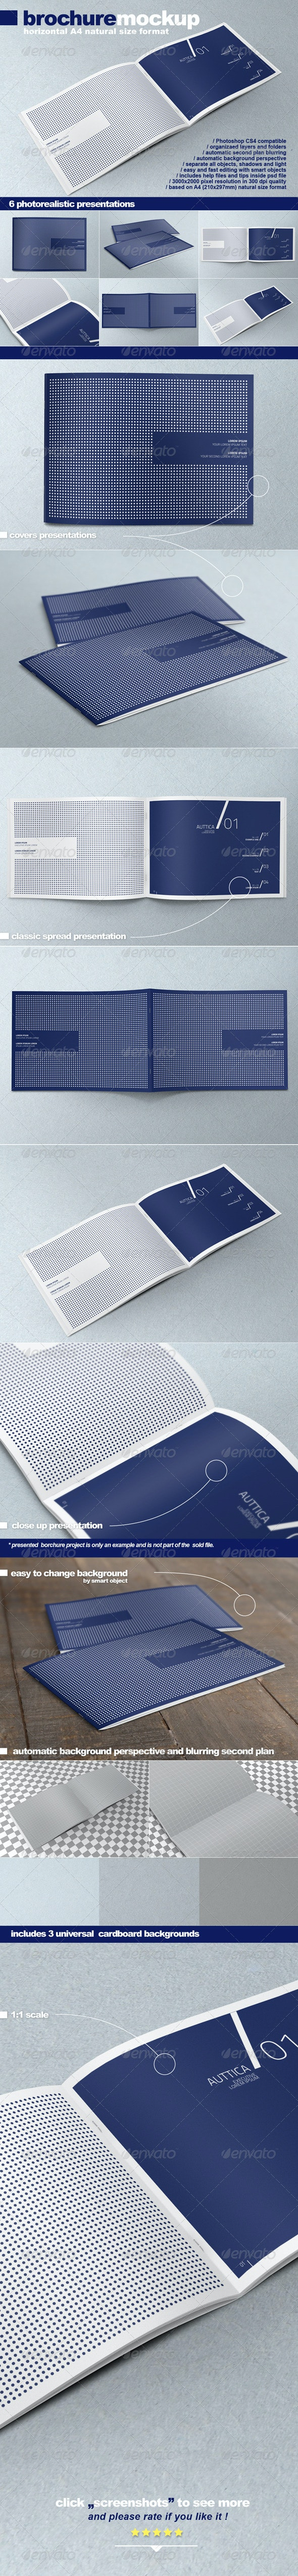 Horizontal A4 Brochure Mock-up - Brochures Print